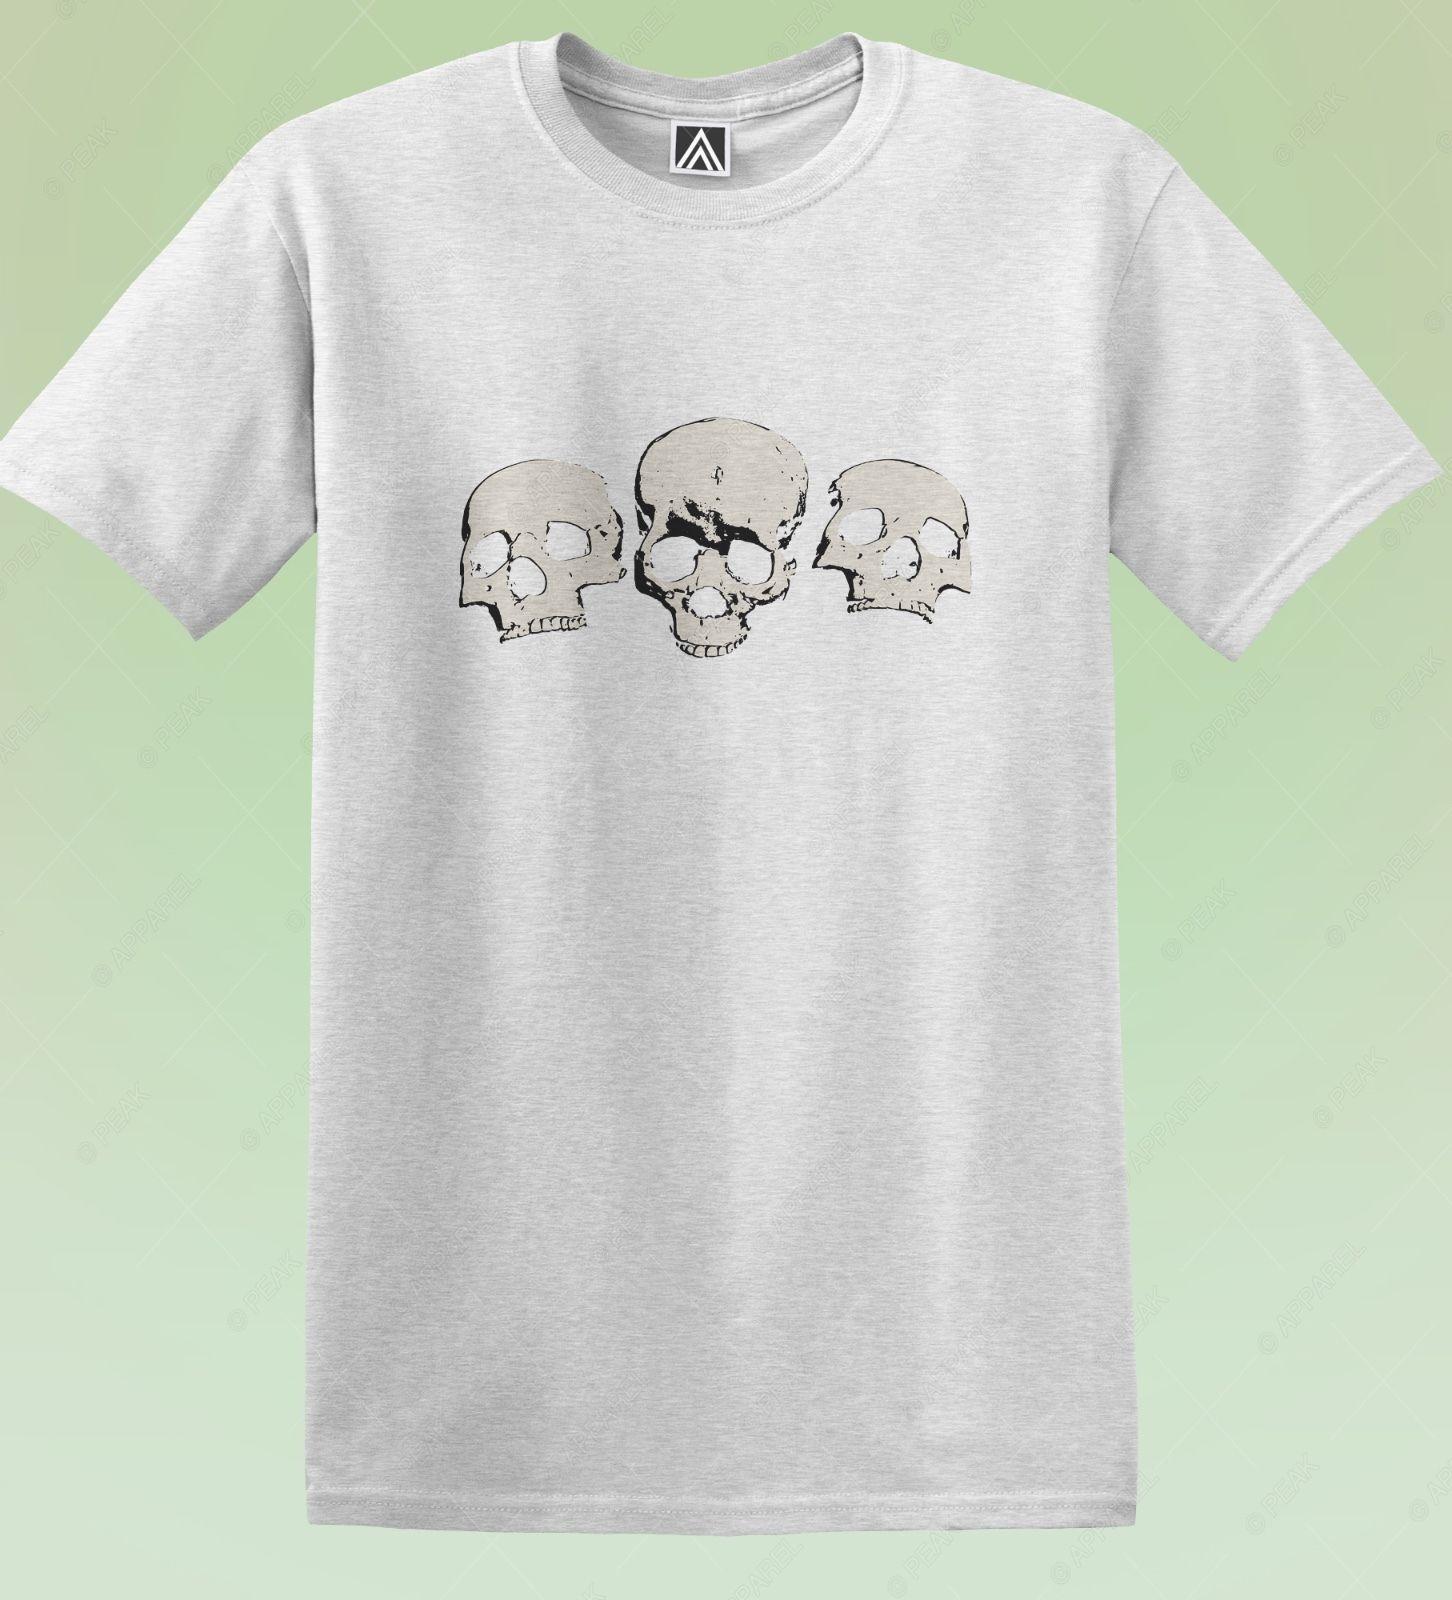 Skulls T-shirt Skeleton Face Brave Gothic Inspired Tee Bones Metal Grunge Top